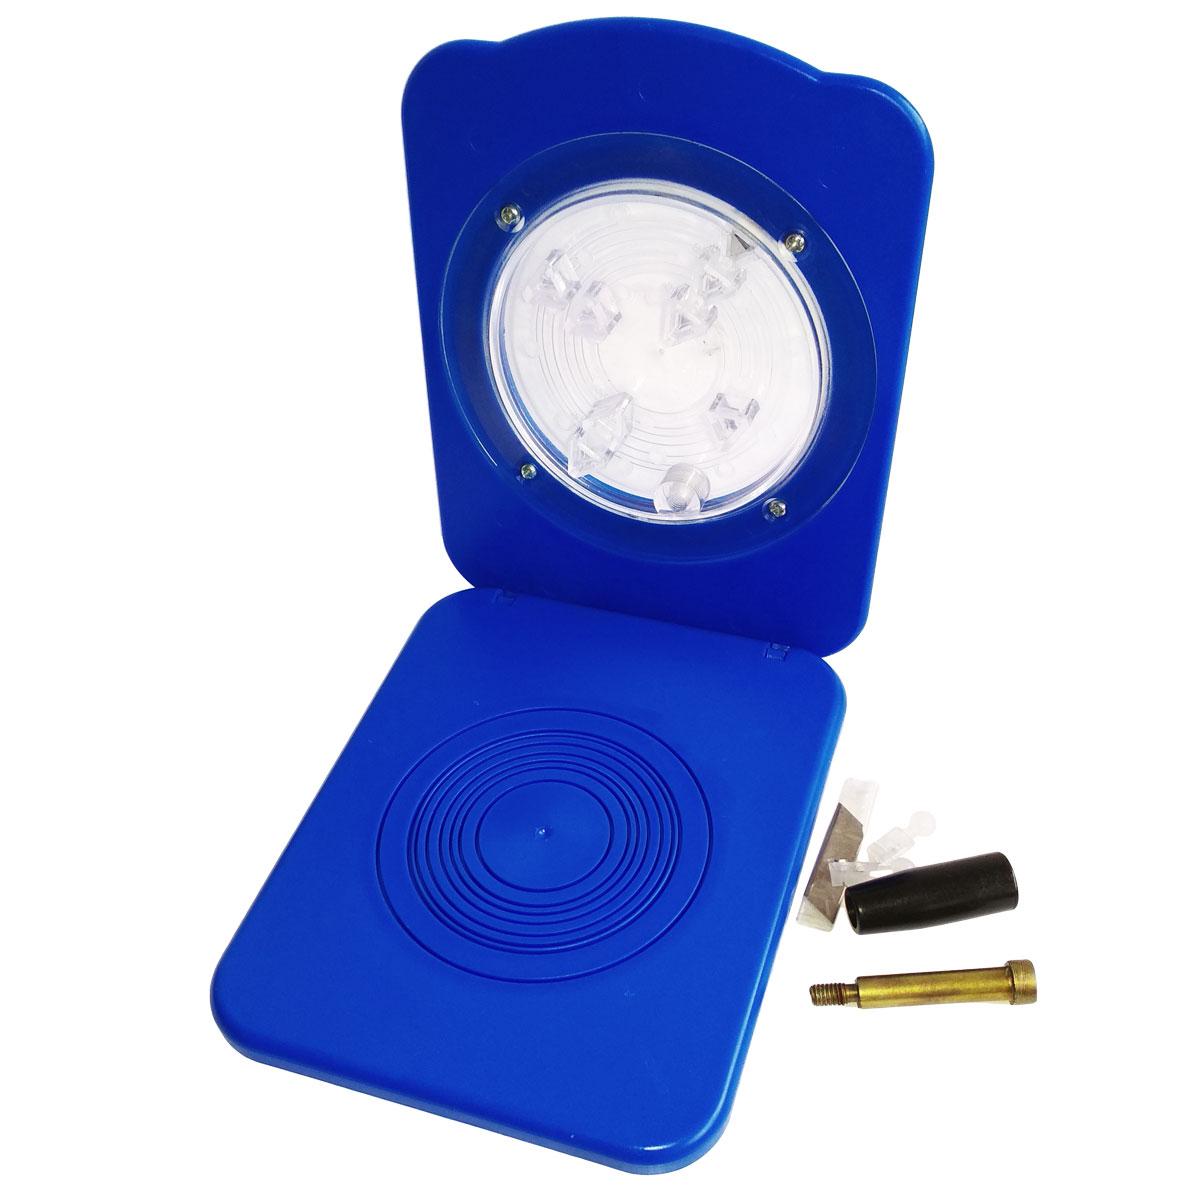 Badge machine - starter set